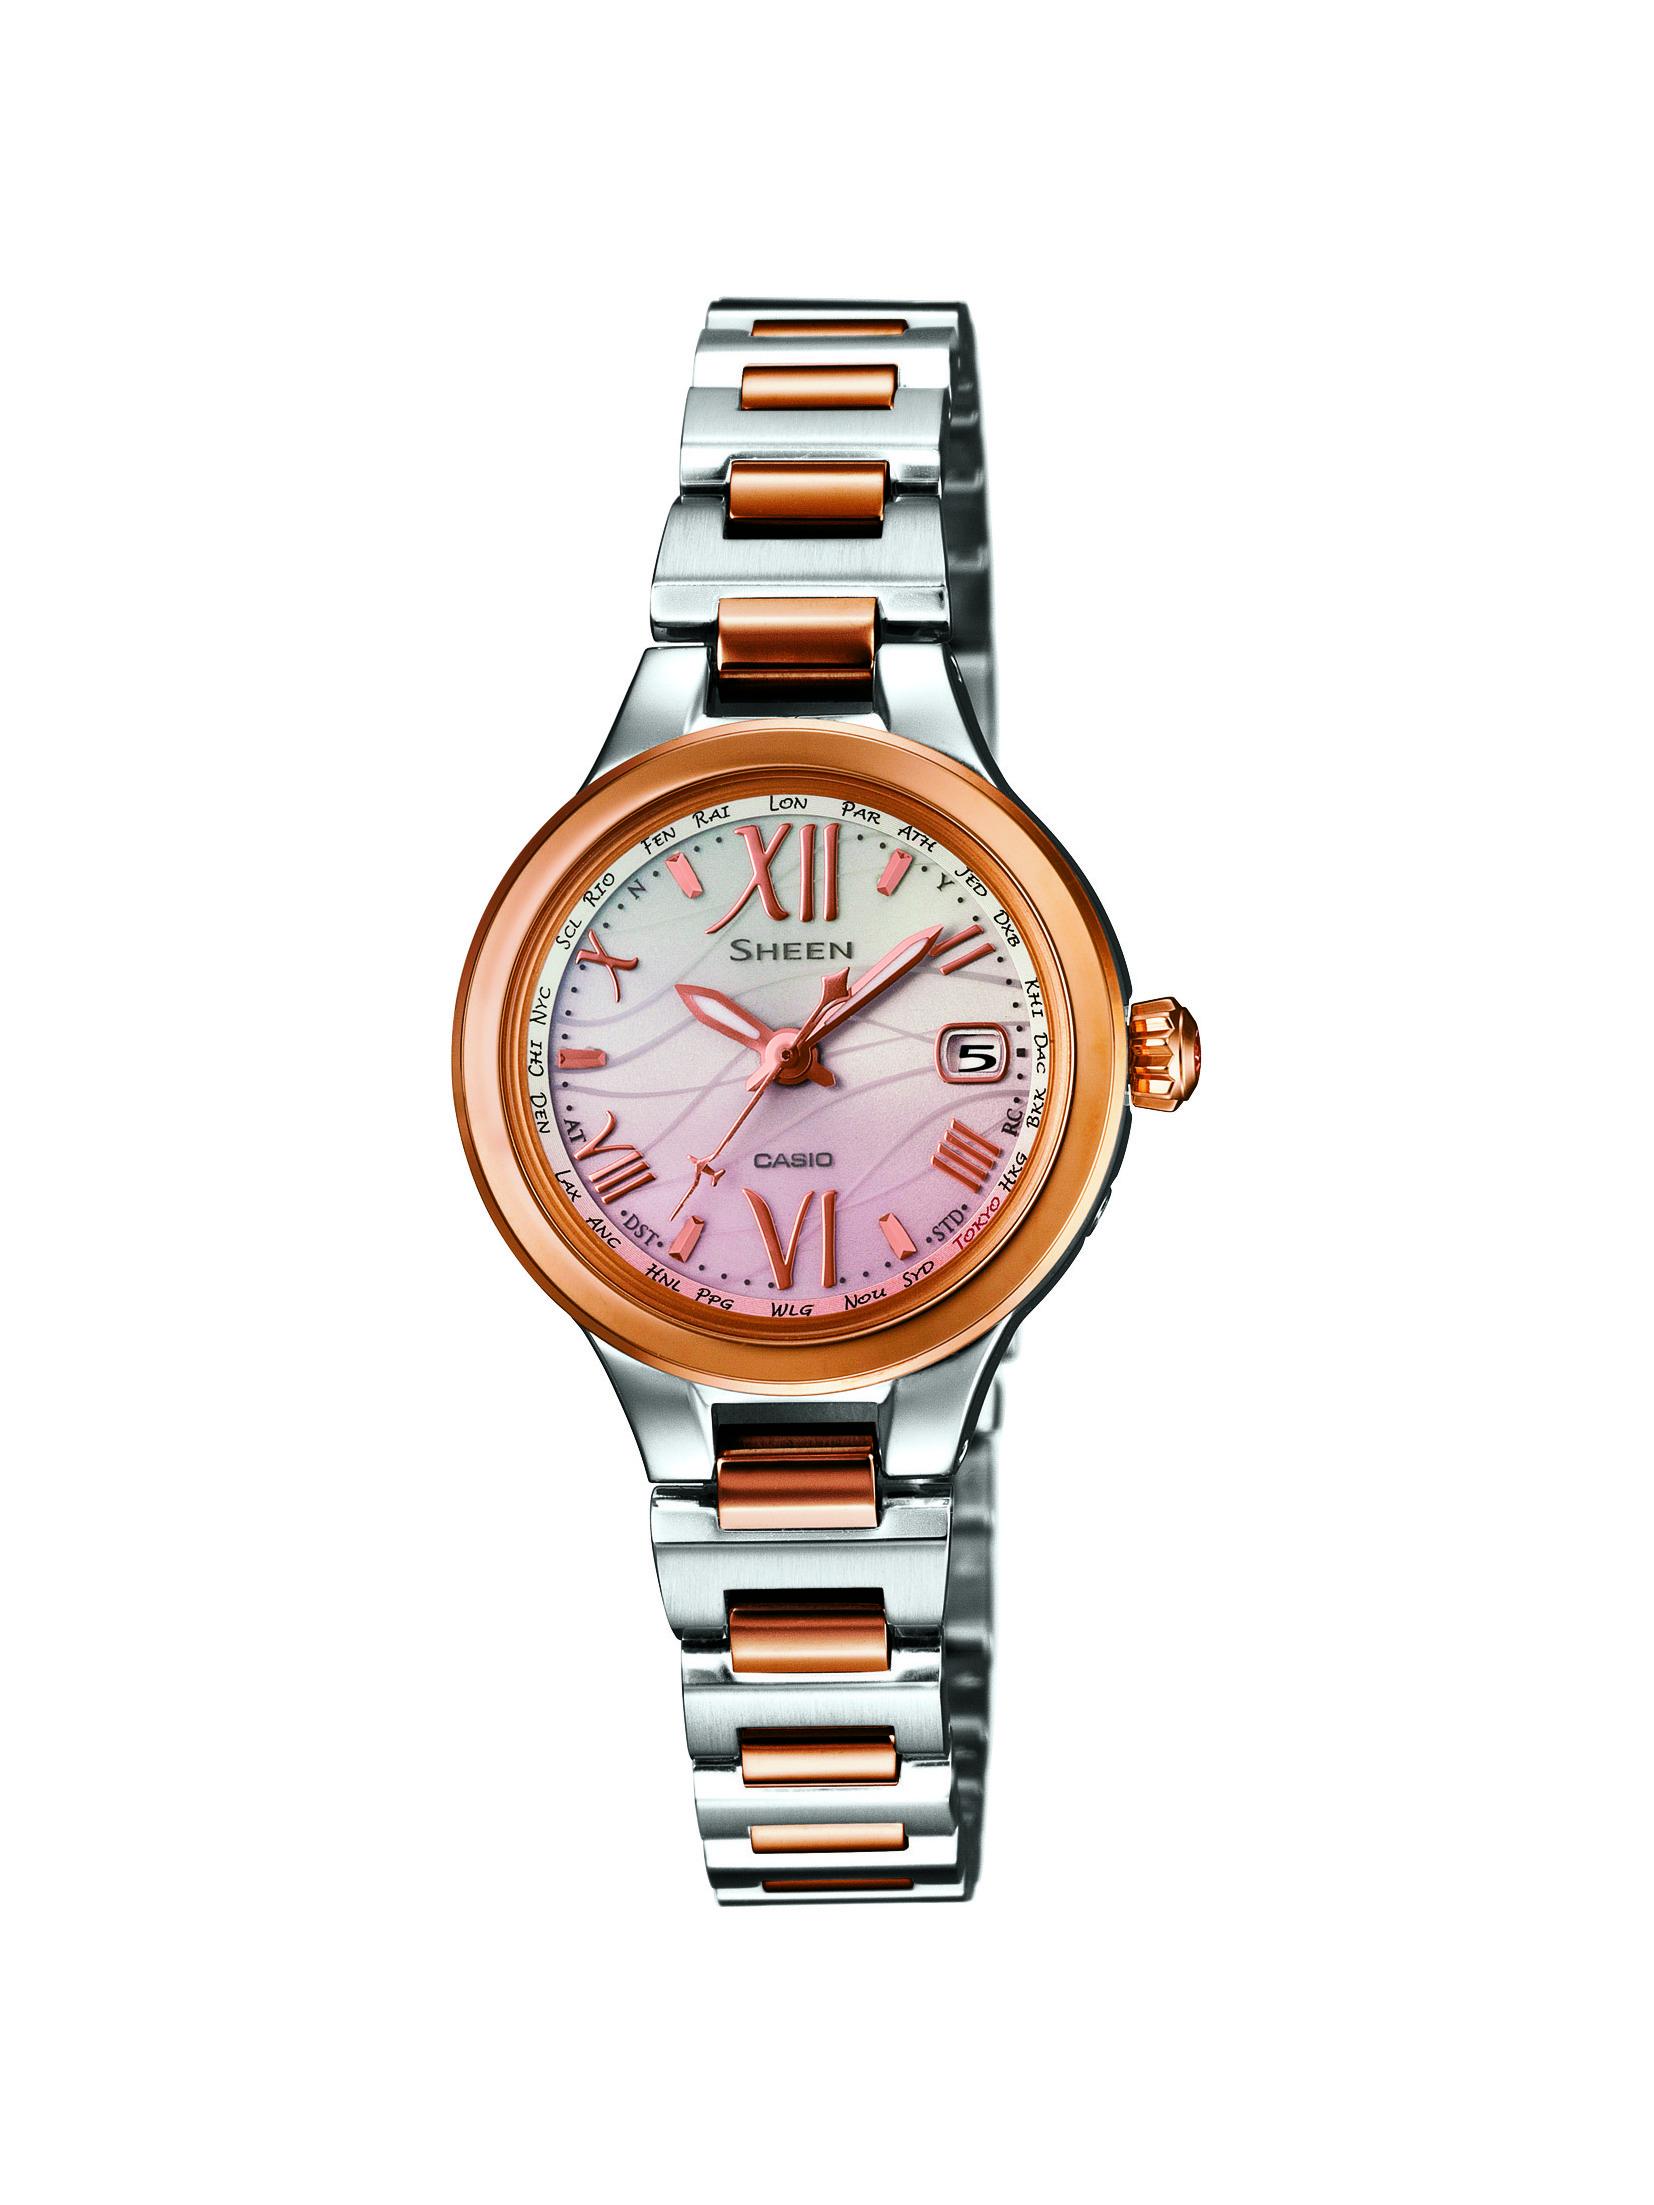 CASIO腕時計 SHEEN SHW-1700SG-4AJF C-0127